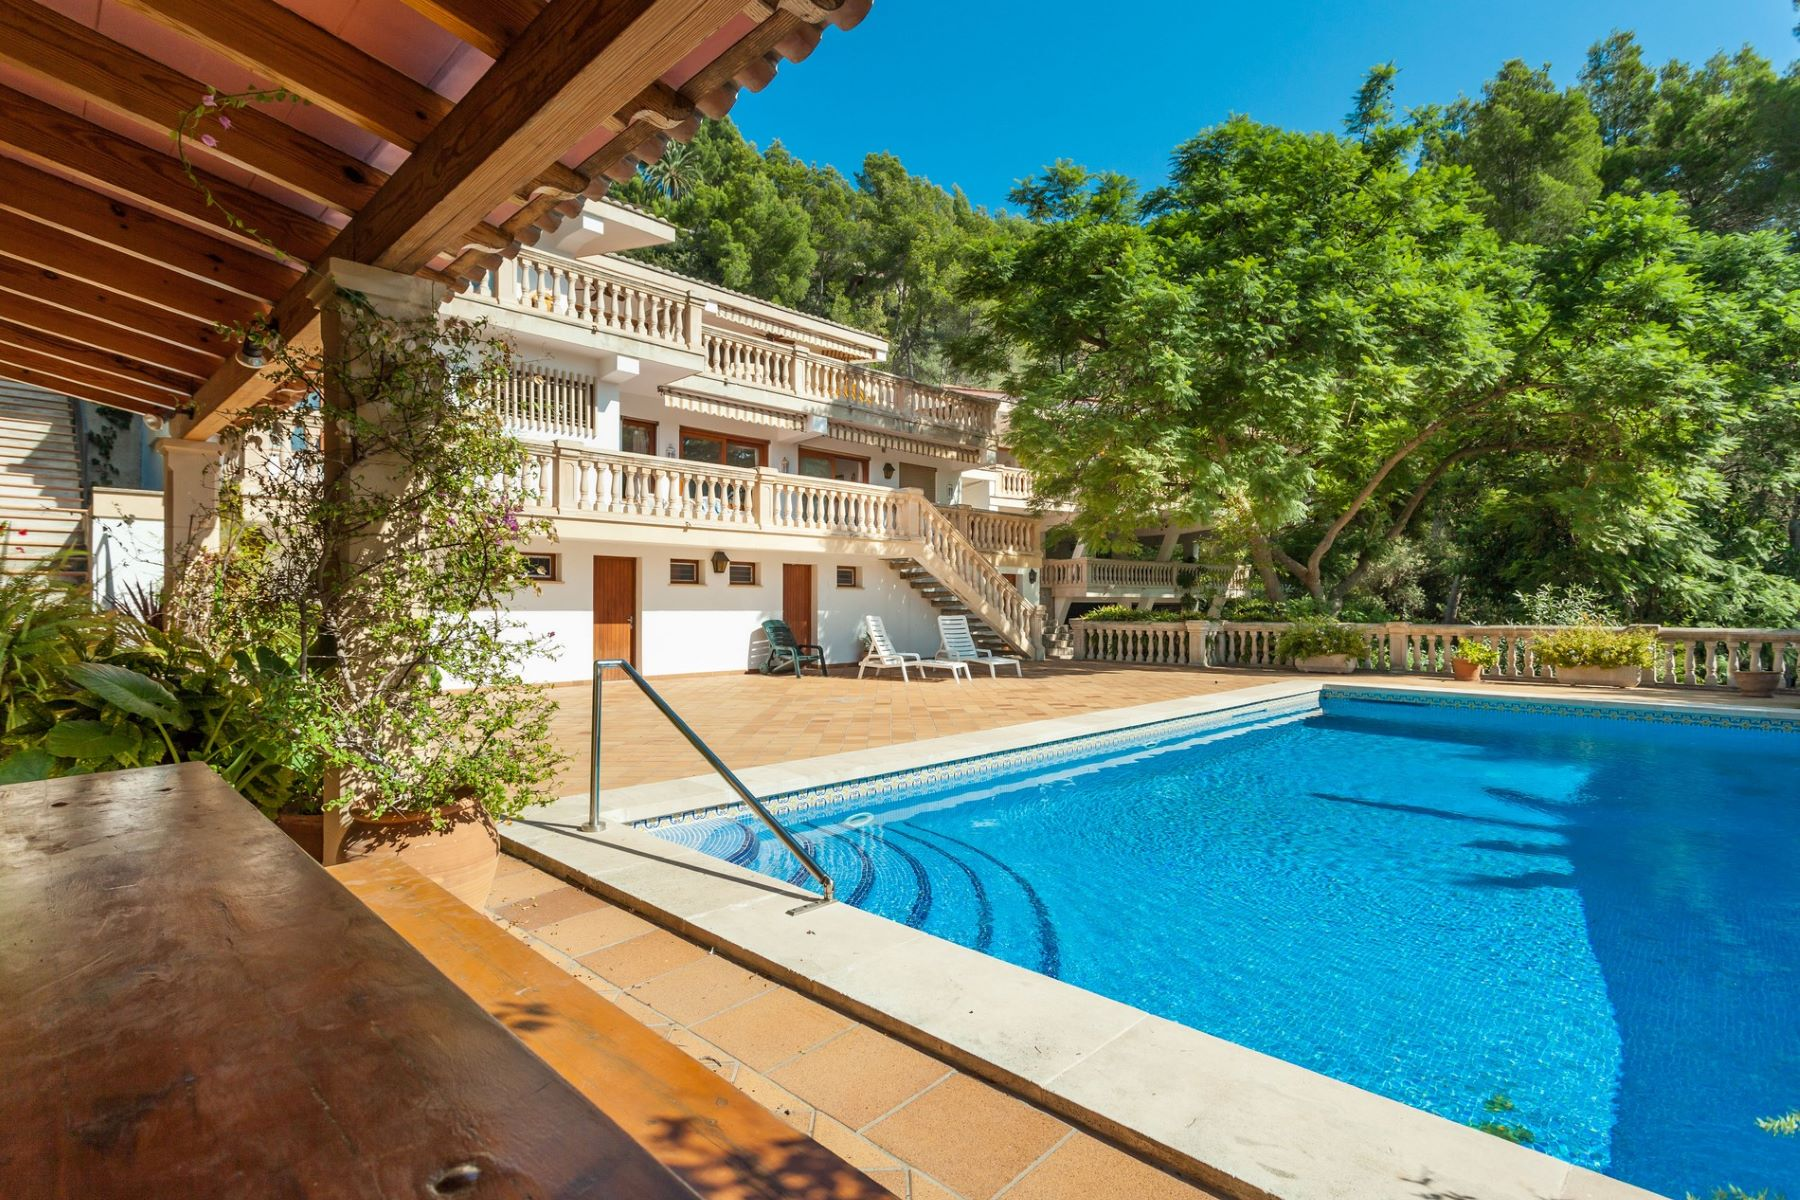 Maison unifamiliale pour l Vente à Californian style villa in Son Vida Son Vida, Balearic Islands, Espagne